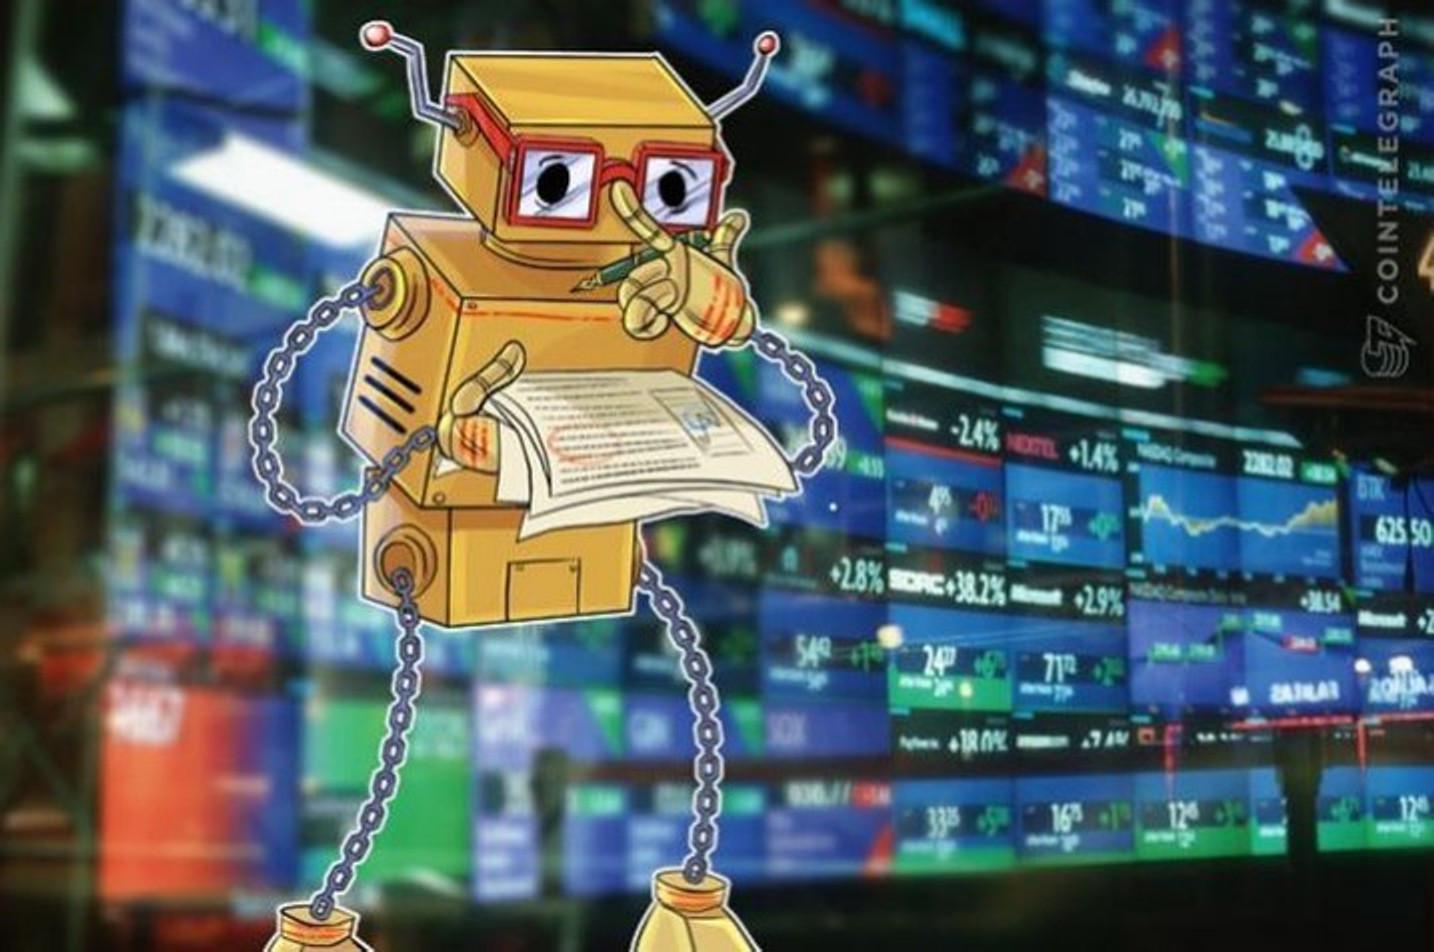 Câmara dos Deputados vai usar blockchain para consultar CPF dos cidadãos brasileiros